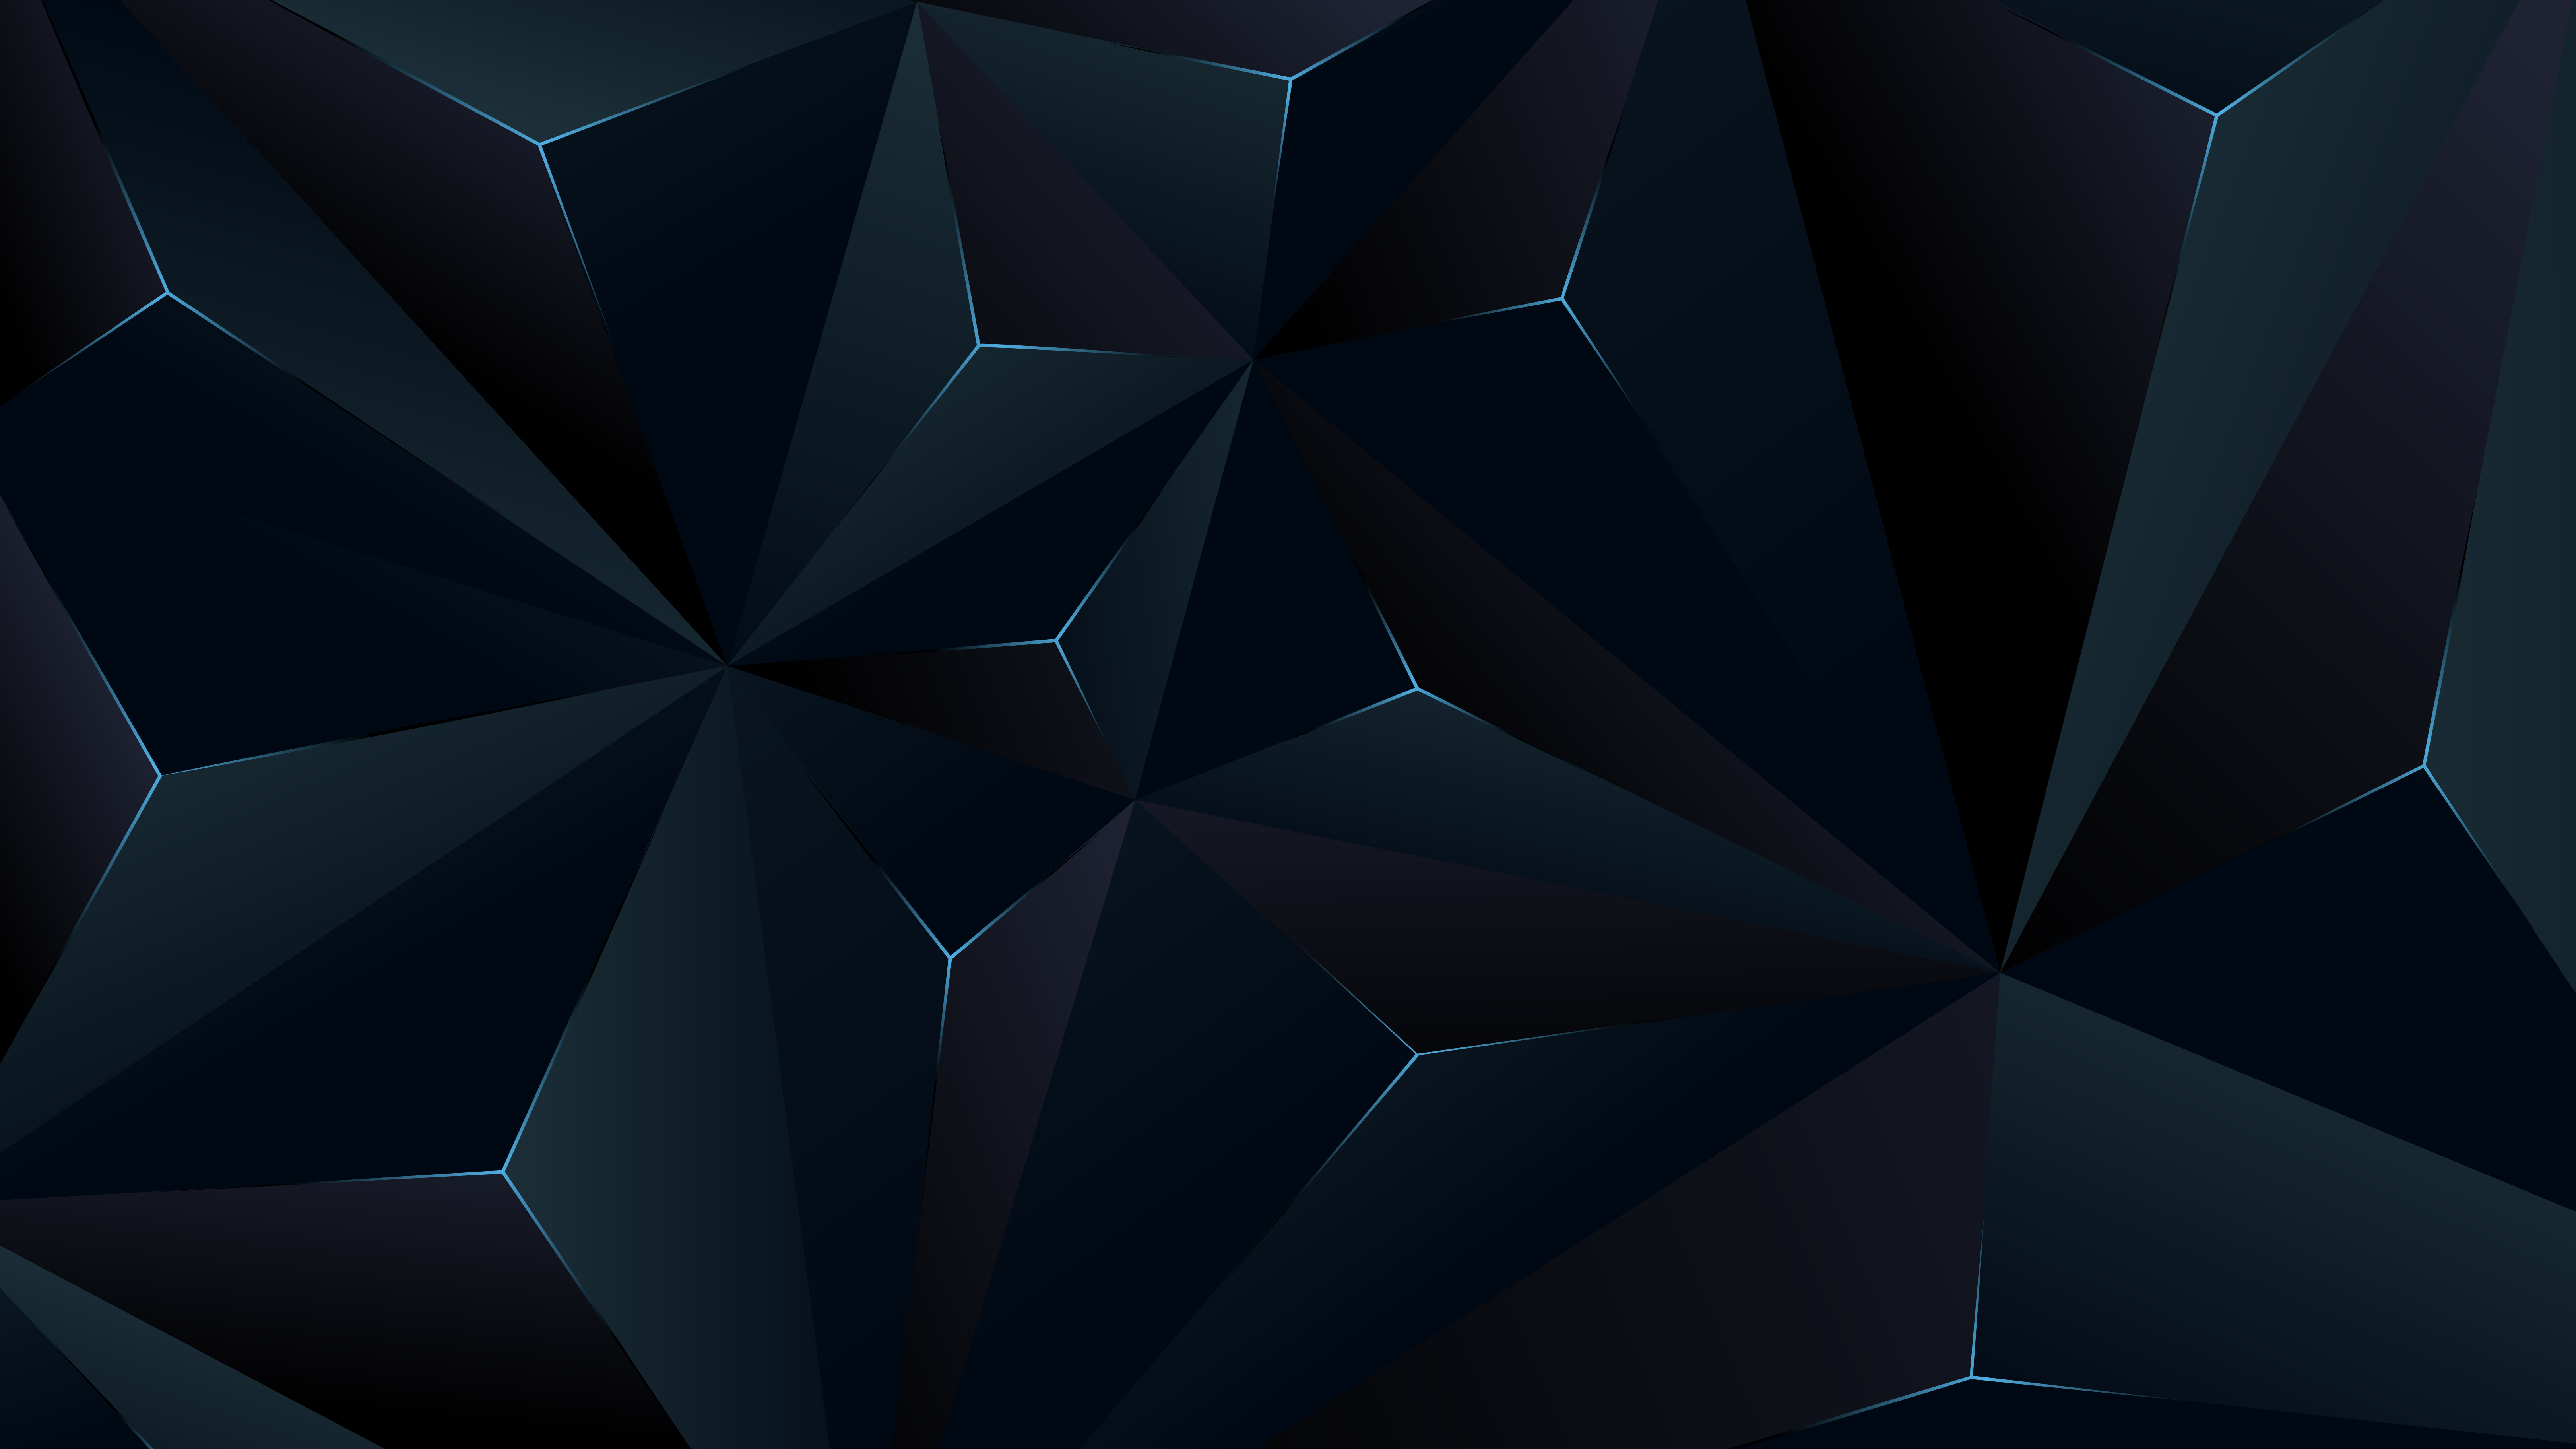 General 6480x3645 abstract 3D texture dark digital art triangle